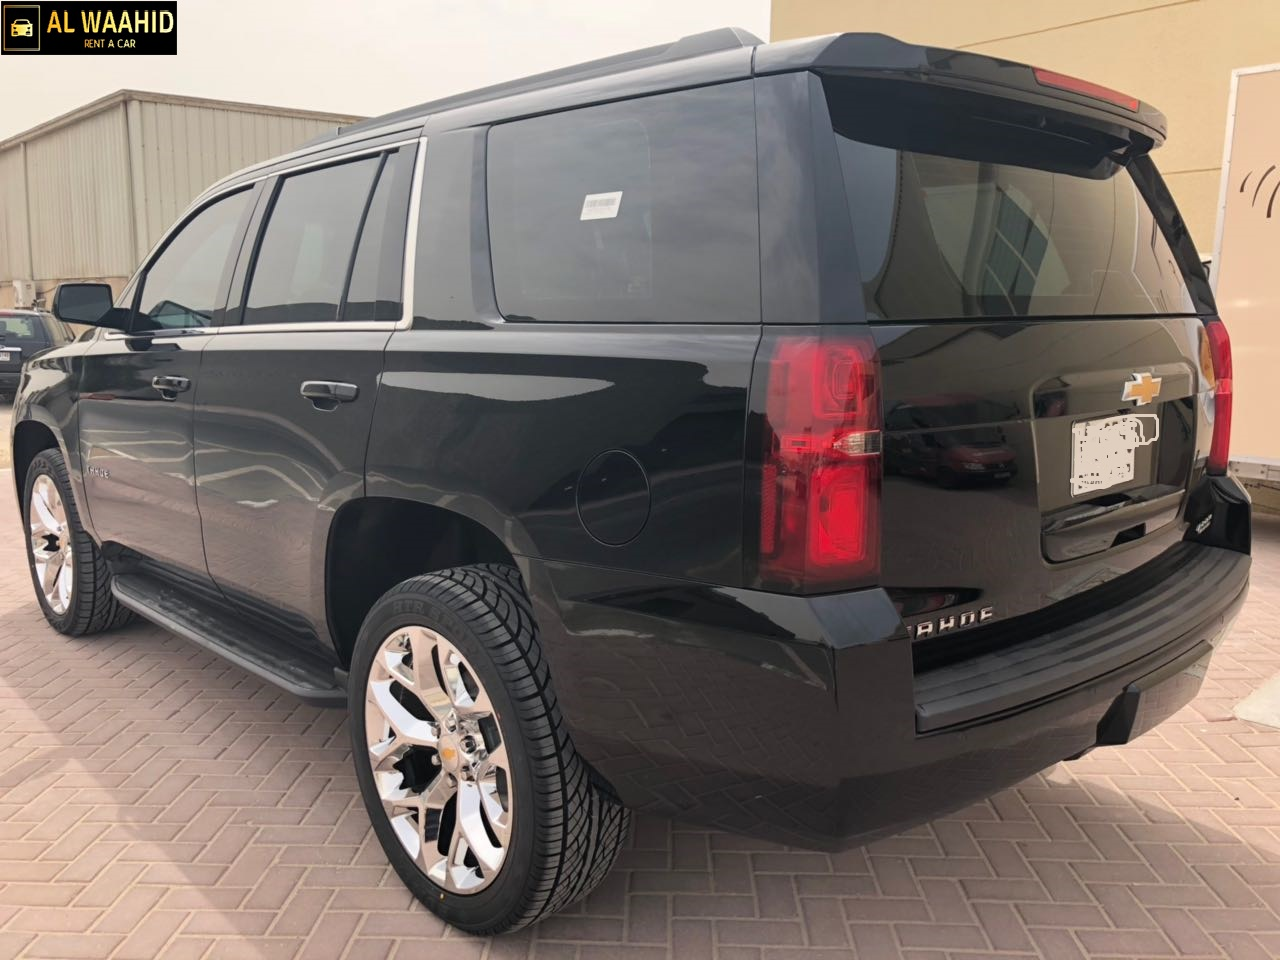 Chevrolet Tahoe 2018 luxury car rental dubai alwaahid rent a car